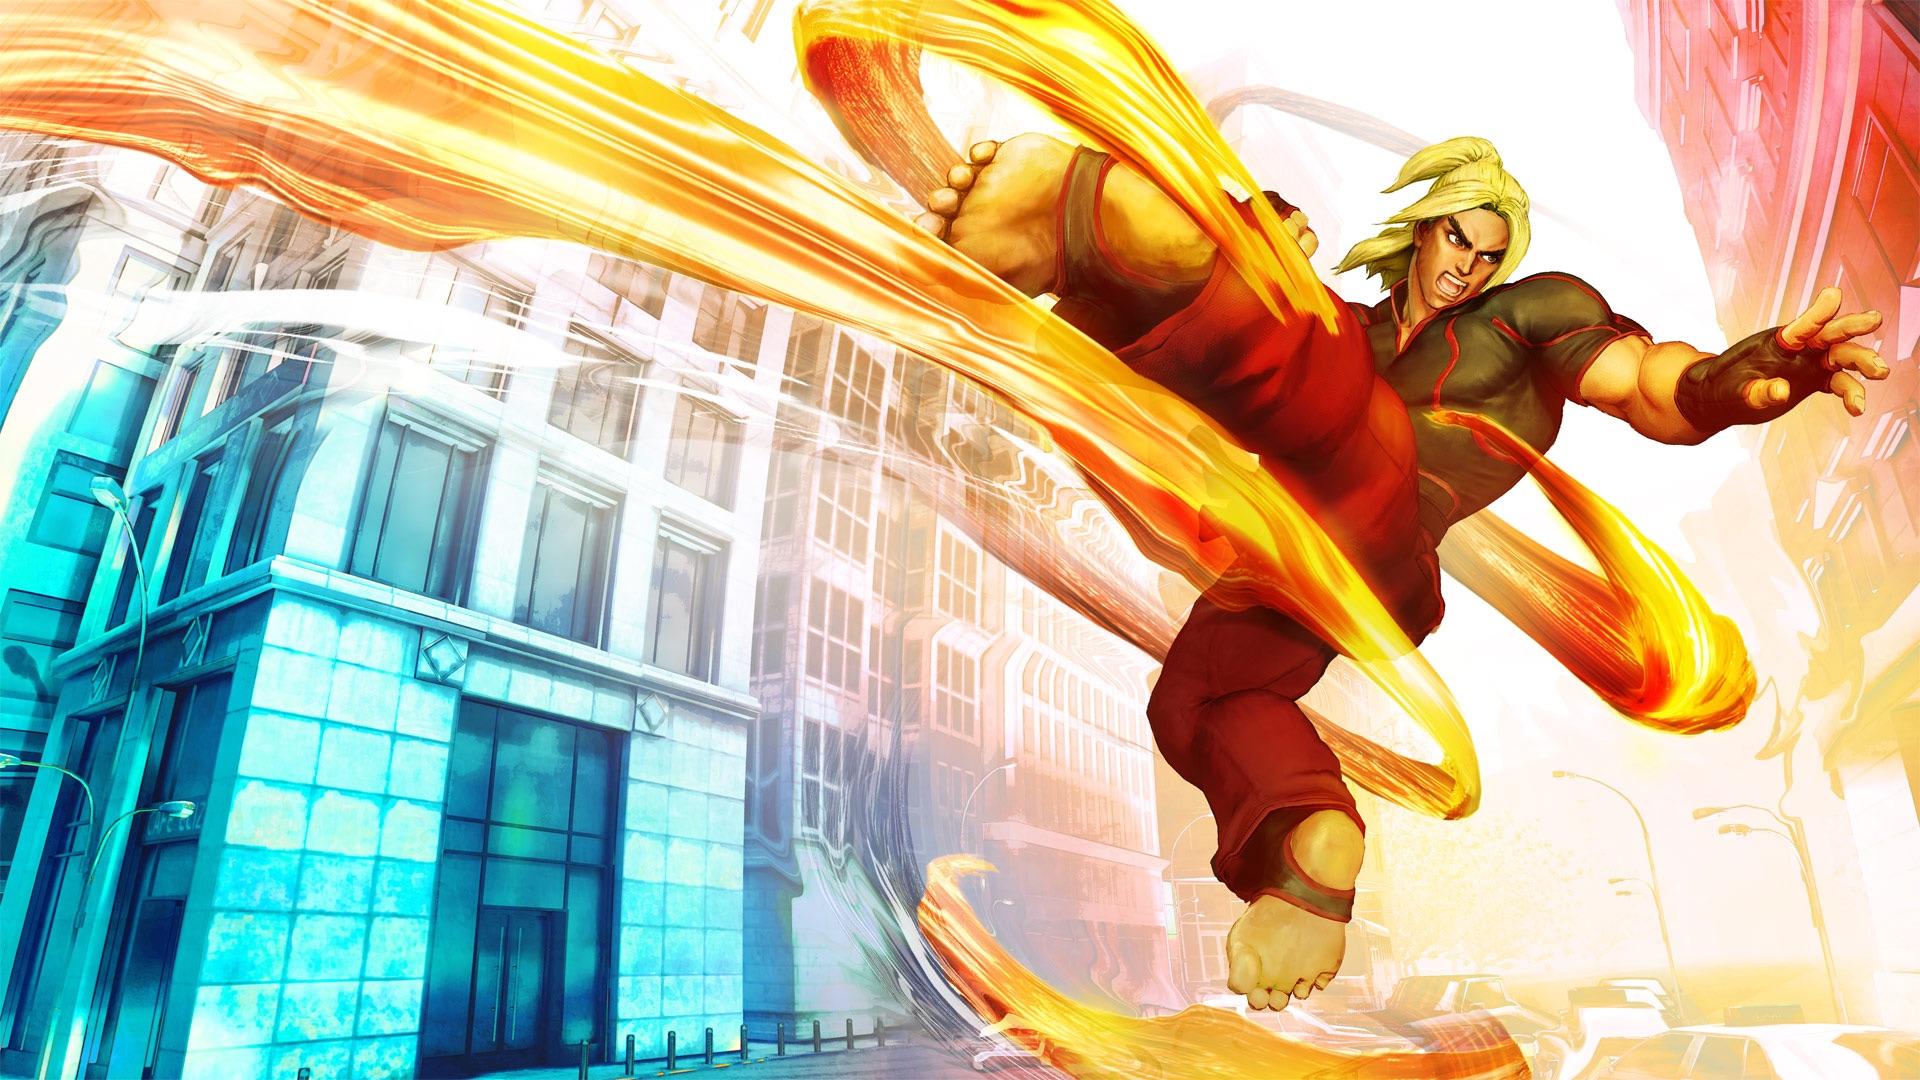 Ken S Offical Artwork In Street Fighter 5 Street Fighter Know